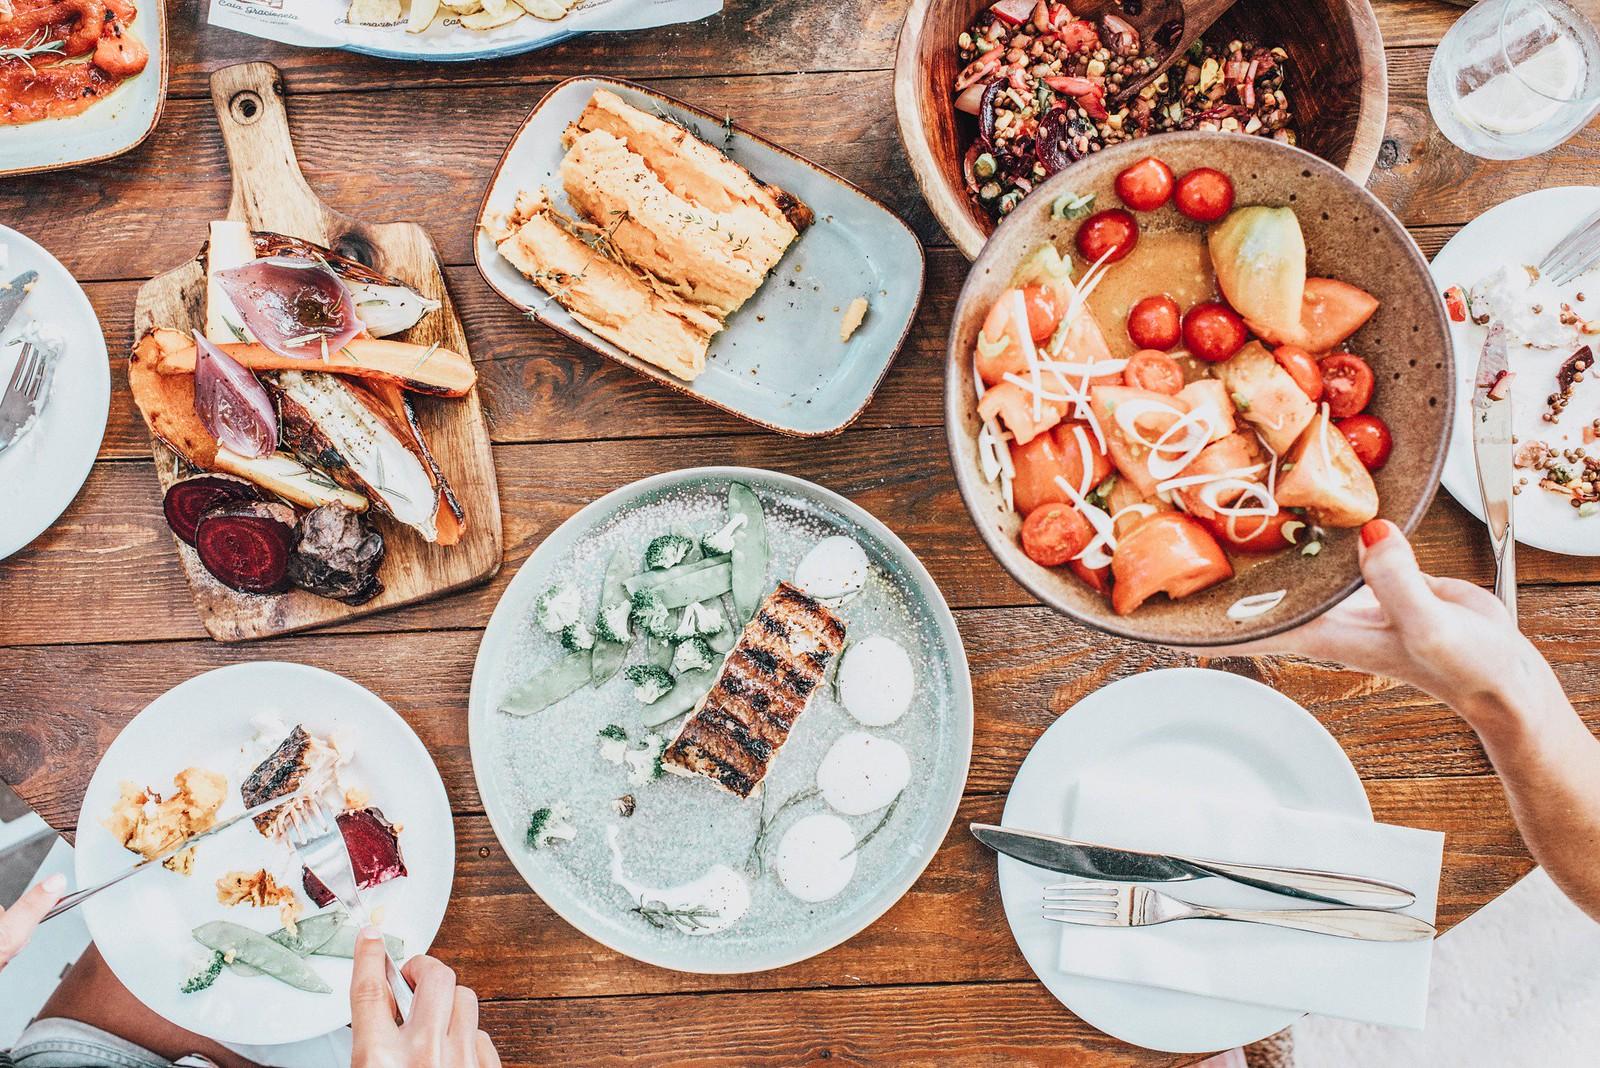 https://www.white-ibiza.com/wp-content/uploads/2020/09/white-ibiza-beach-restaurants-cala-gracioneta-chiringuito-07.jpg